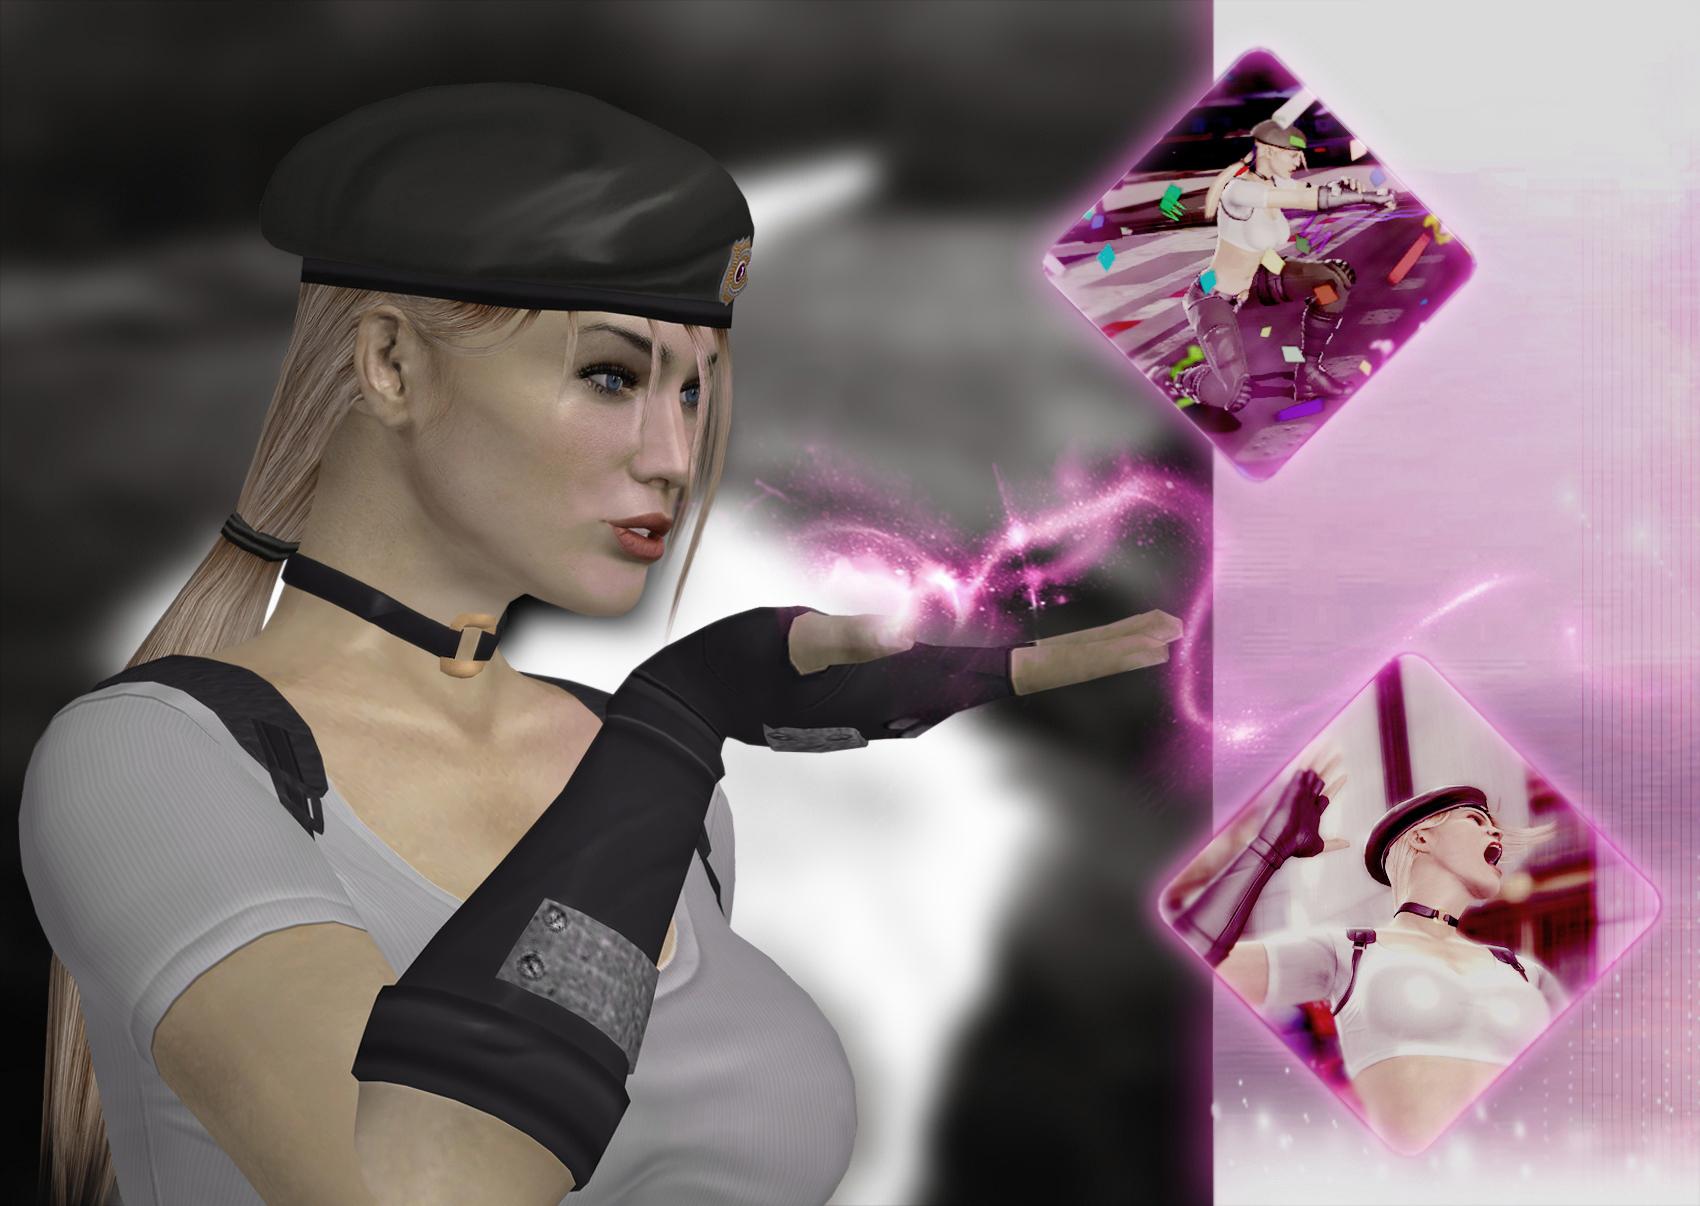 Sonya Blade images MK vs DC Universe - 954.4KB